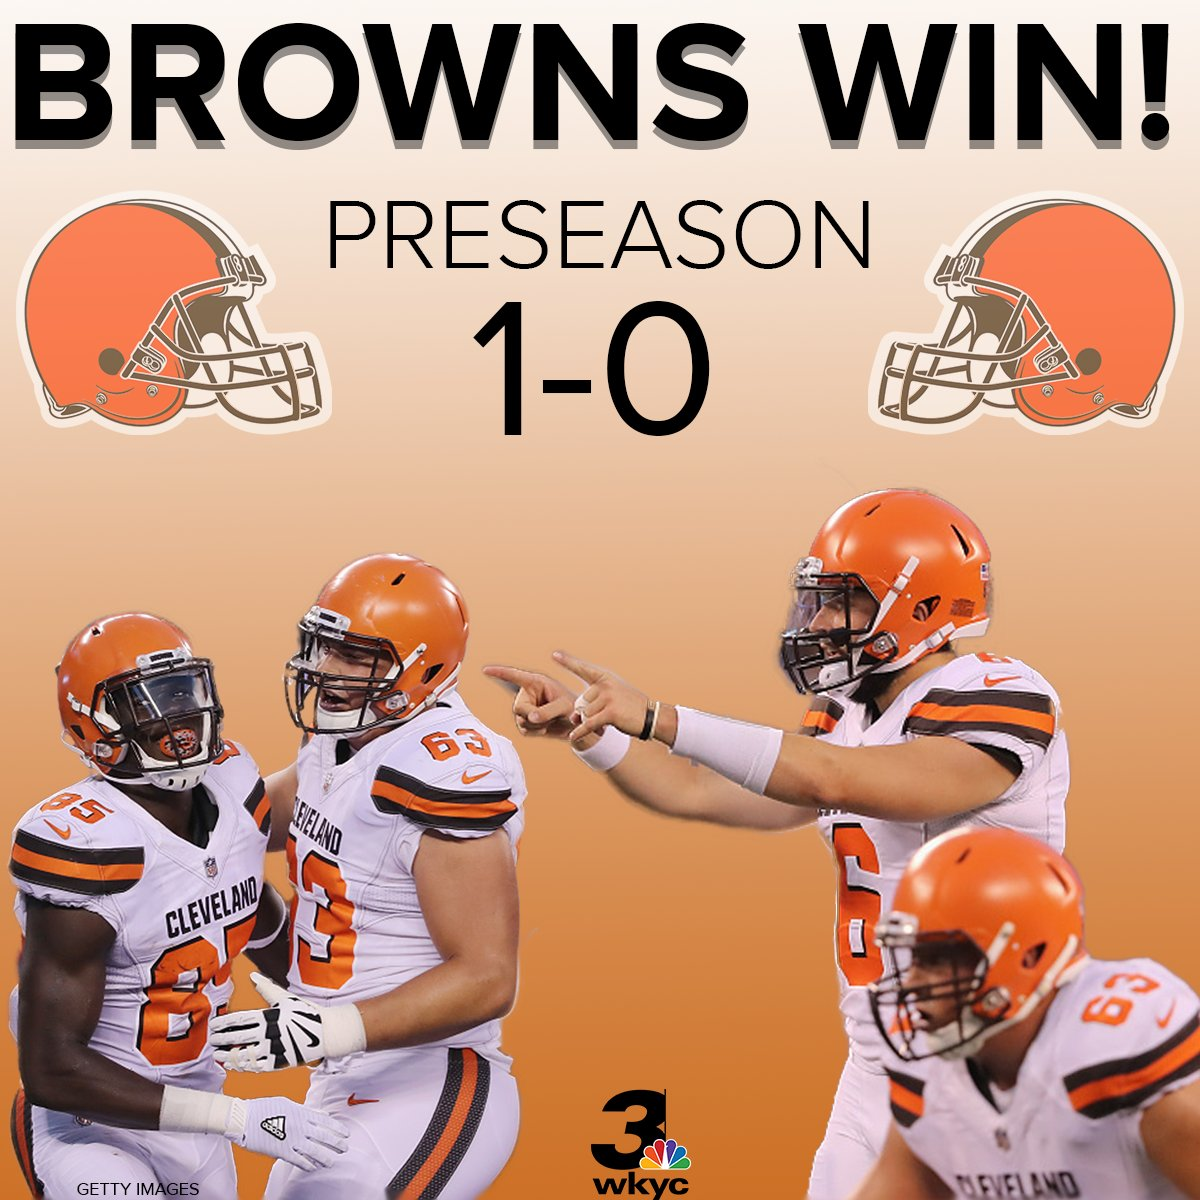 #Browns earn 20-10 win over #Giants in preseason opener at #MetLifeStadium #3Browns @wkyc https://t.co/smVeKVPItY